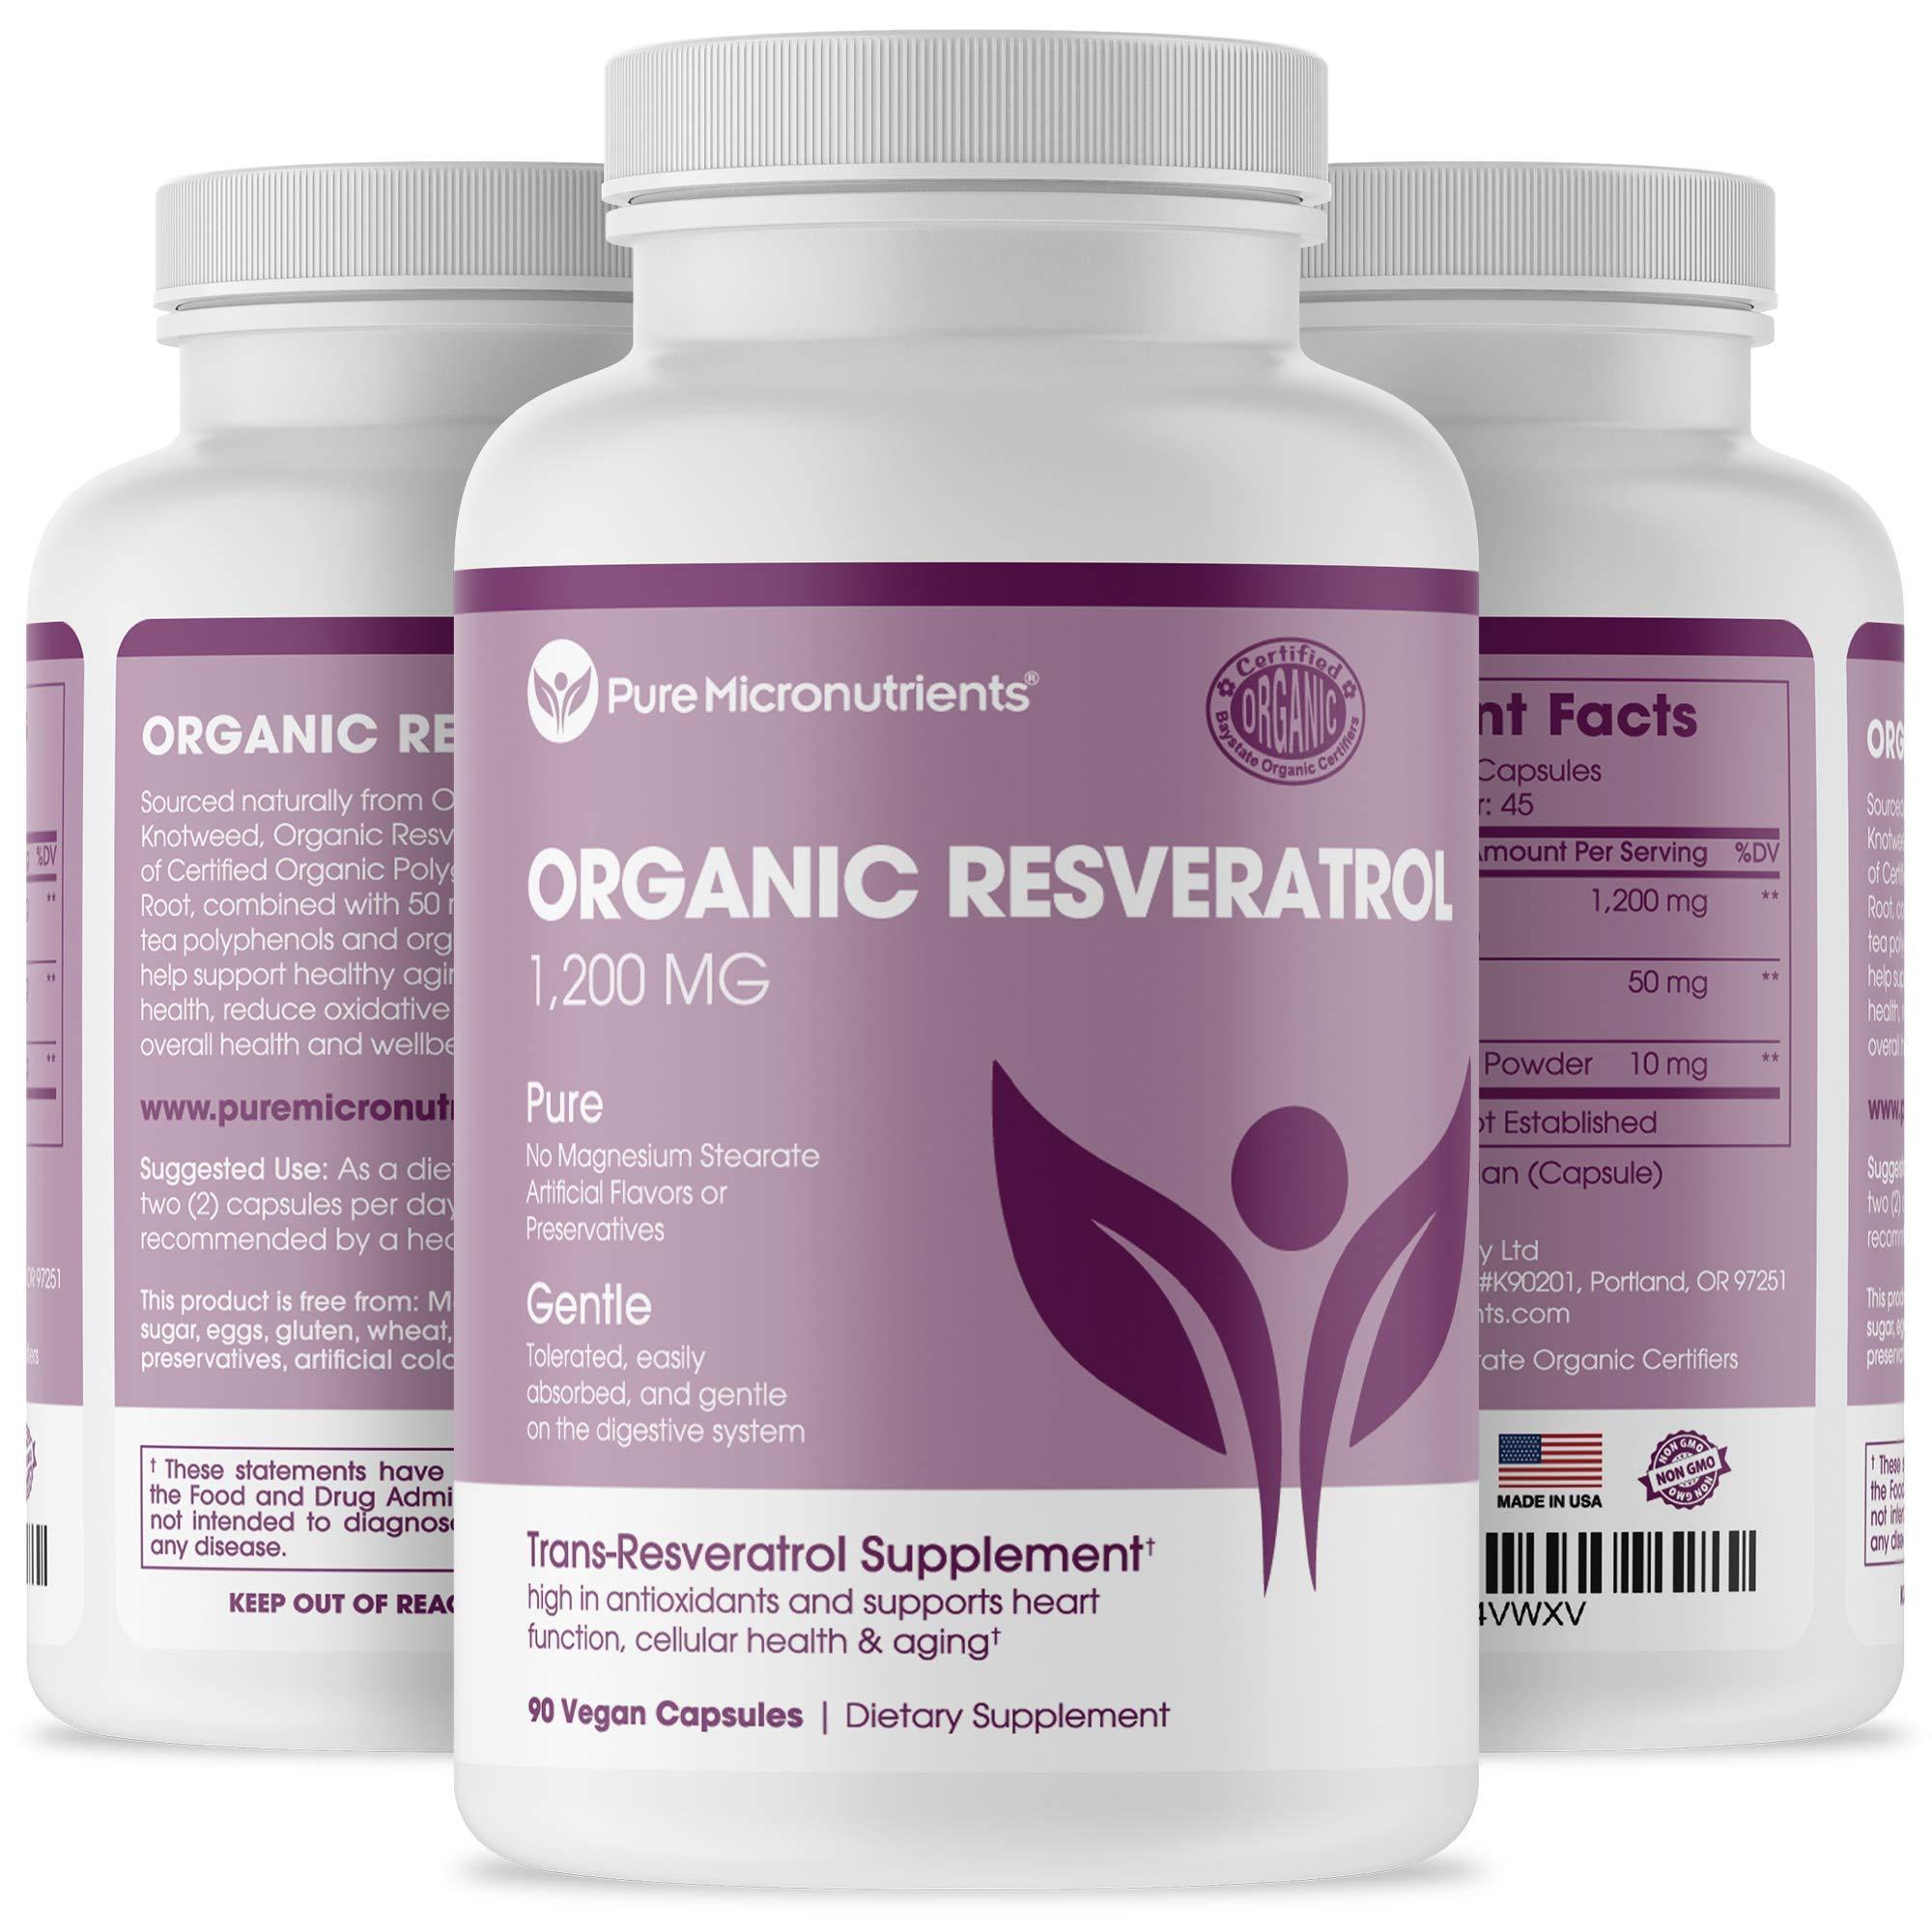 Organic Resveratrol Supplement 1200mg - Extra Strength Formula for Maximum Anti Aging, Immune & Heart Health - 90 Vegan Capsules with Trans-Resveratrol, Green Tea Leaf & Black Pepper